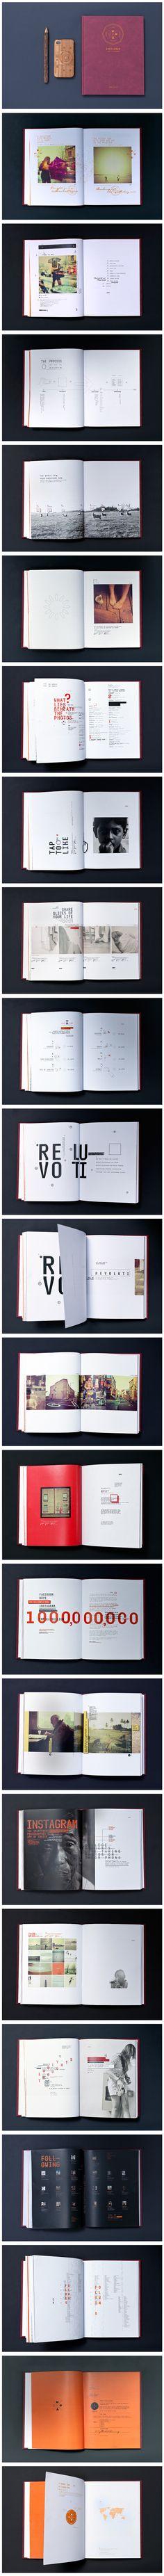 Instagram, a visual journey book #creative #layout #magazine